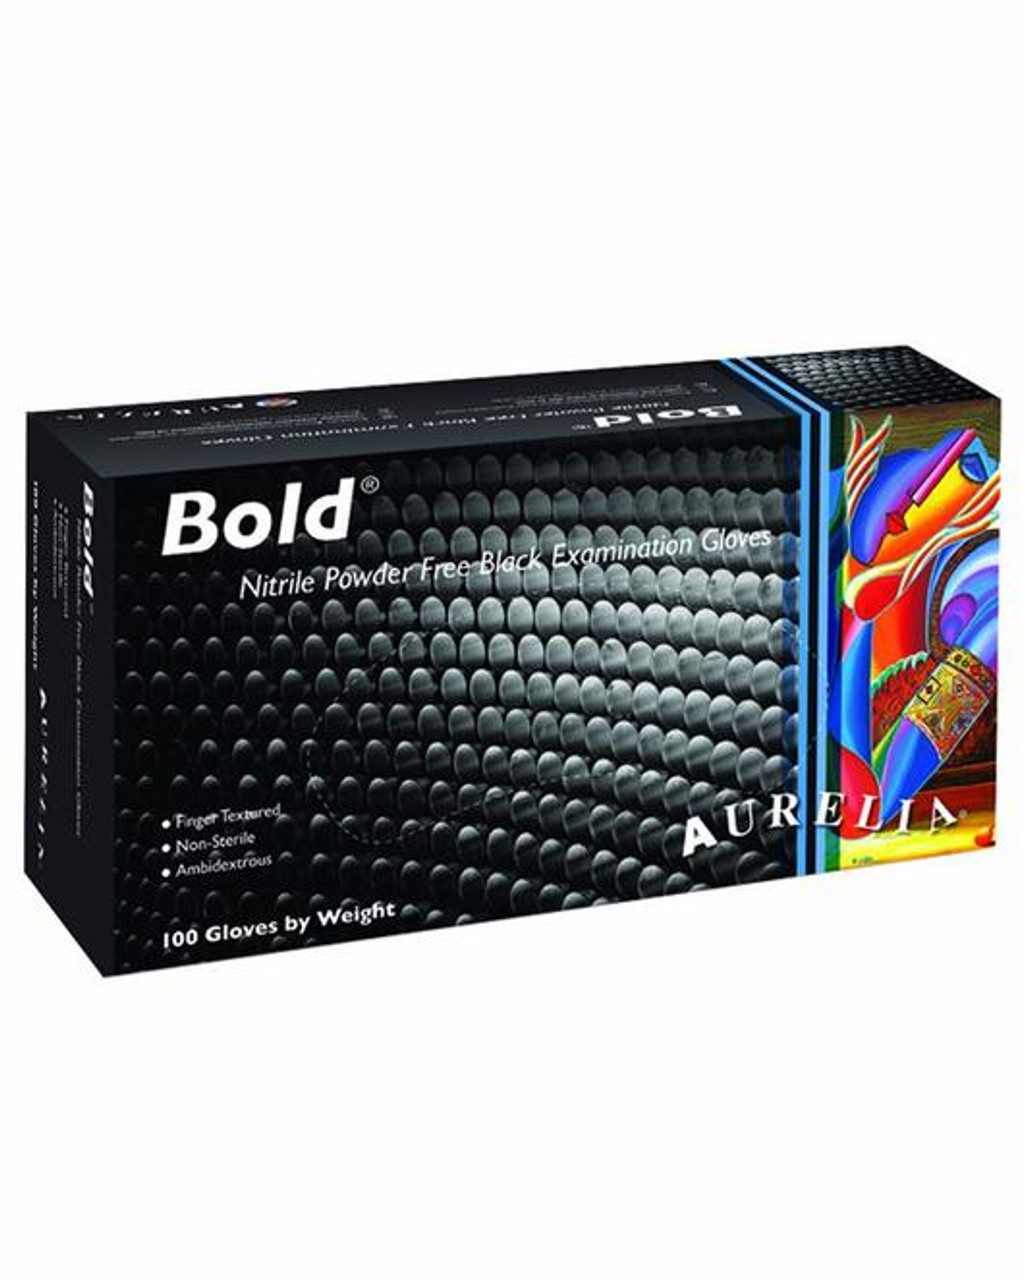 Aurelia Bold Black Nitrile Powder Free 5 Mil Disposable Gloves